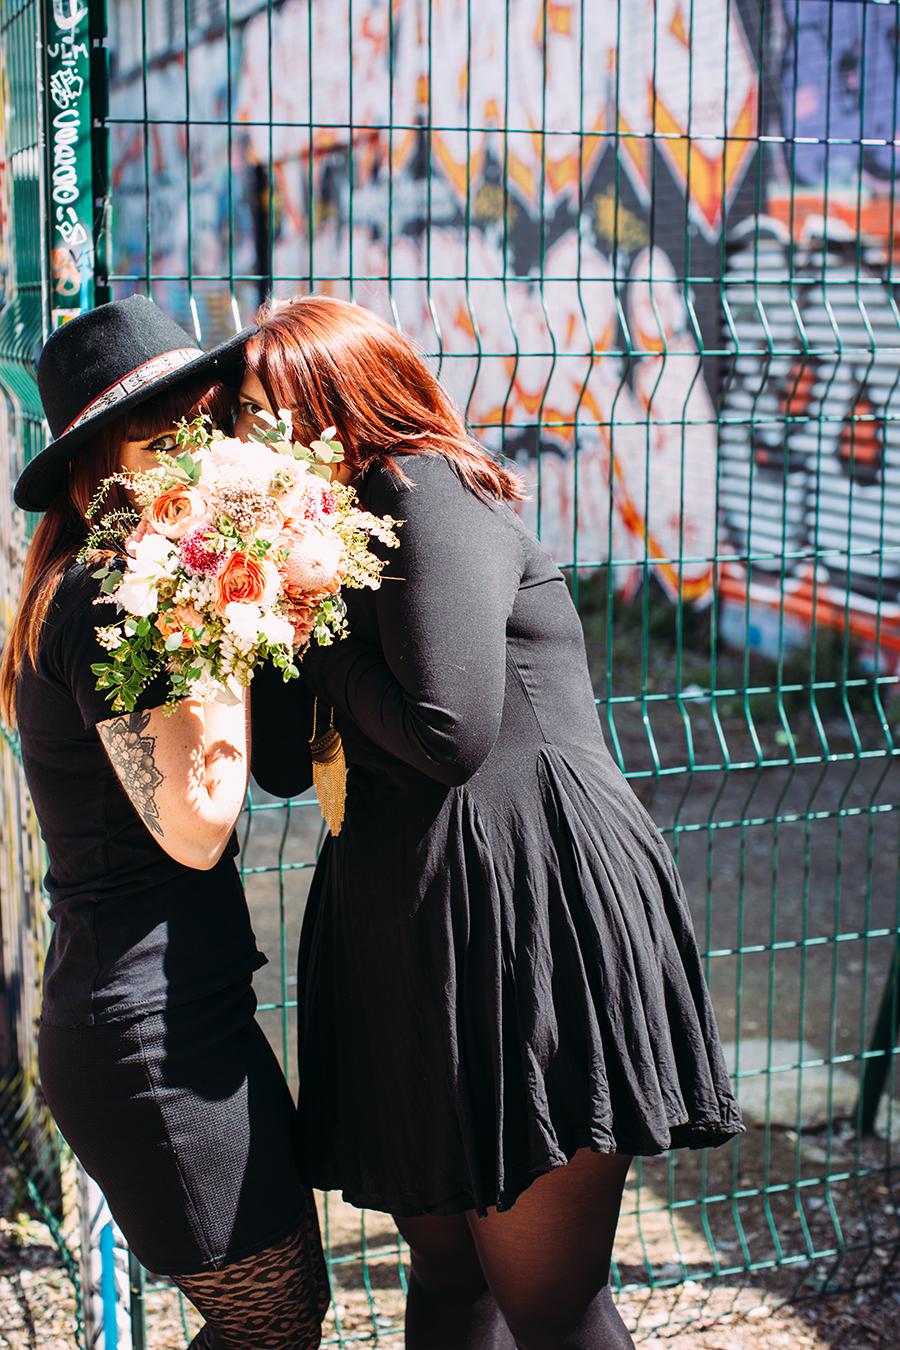 conseil-reussir-ses-photos-couple-mariage (61)